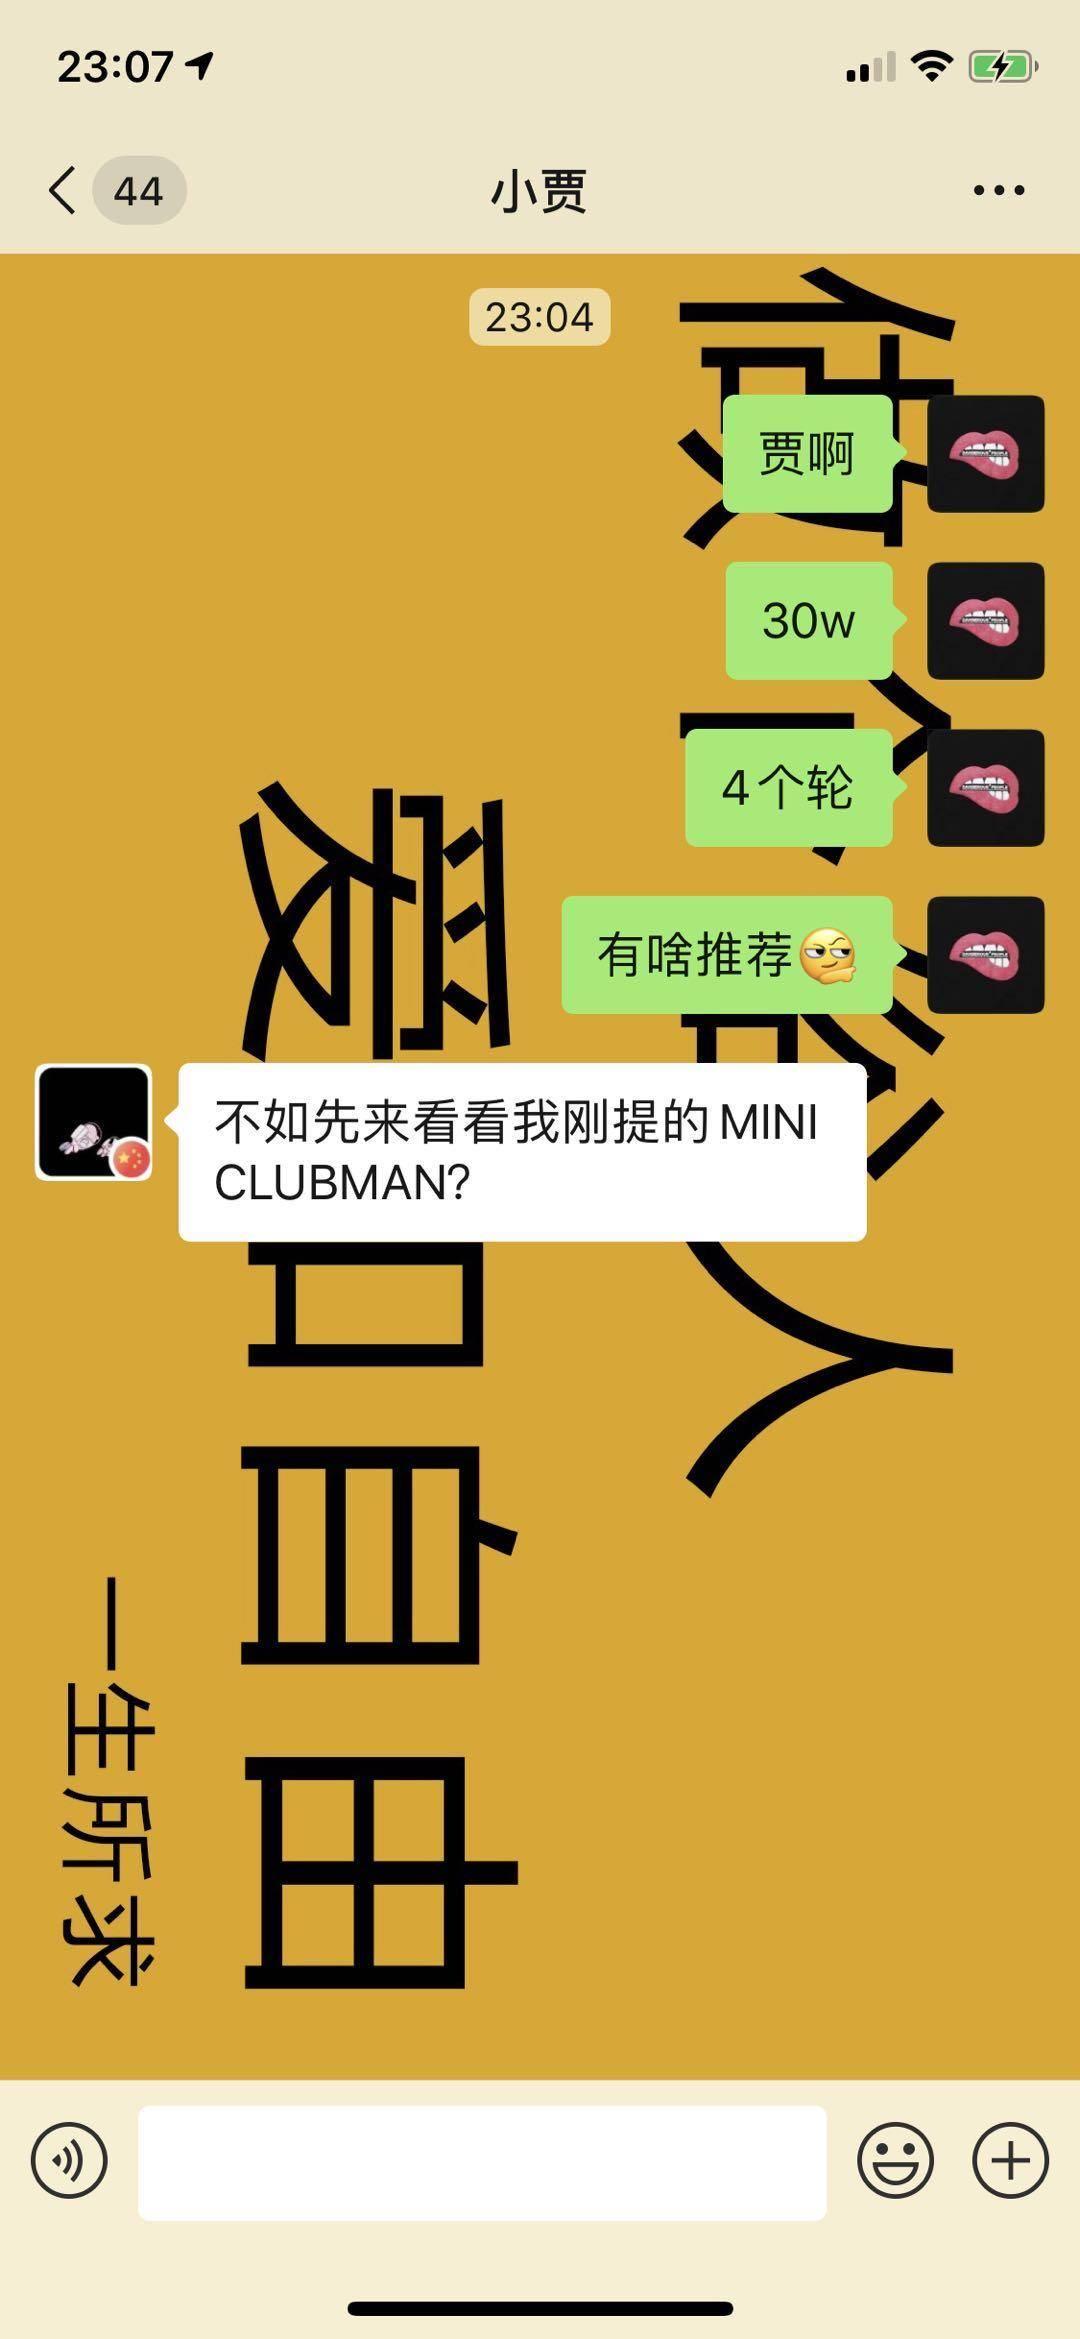 http://cools.qctt.cn/1573140406186.jpeg?imageMogr2/size-limit/1024k!